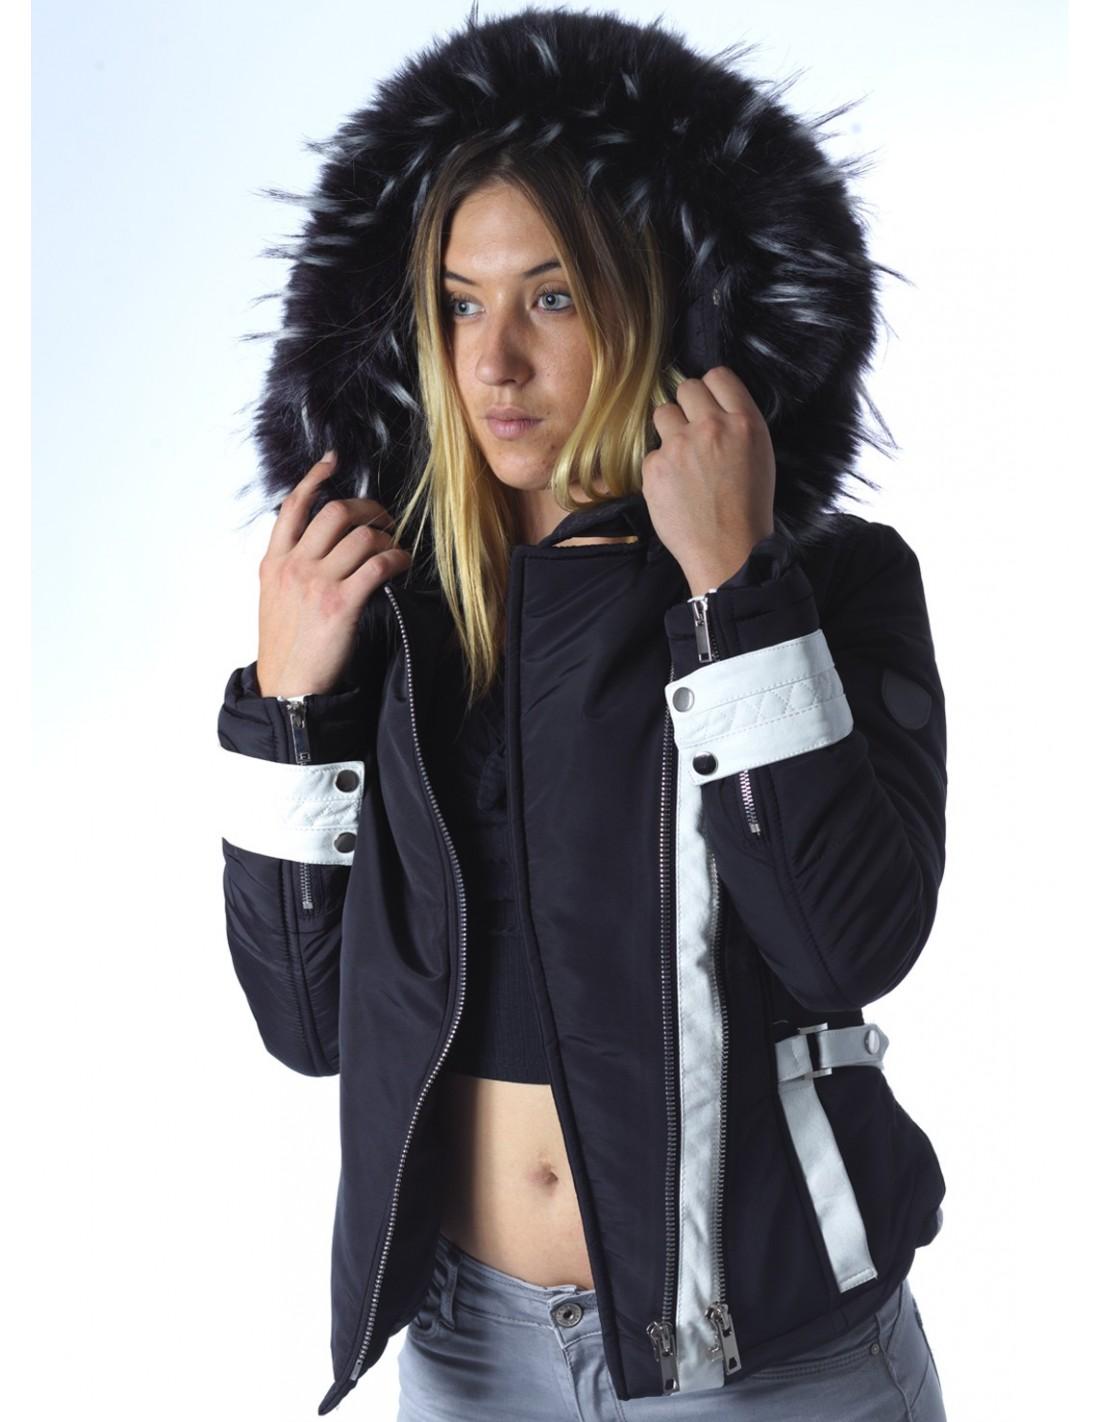 Veste mode Ws970 Noire Fourrure Femme Capuche Zerda rMrzB6